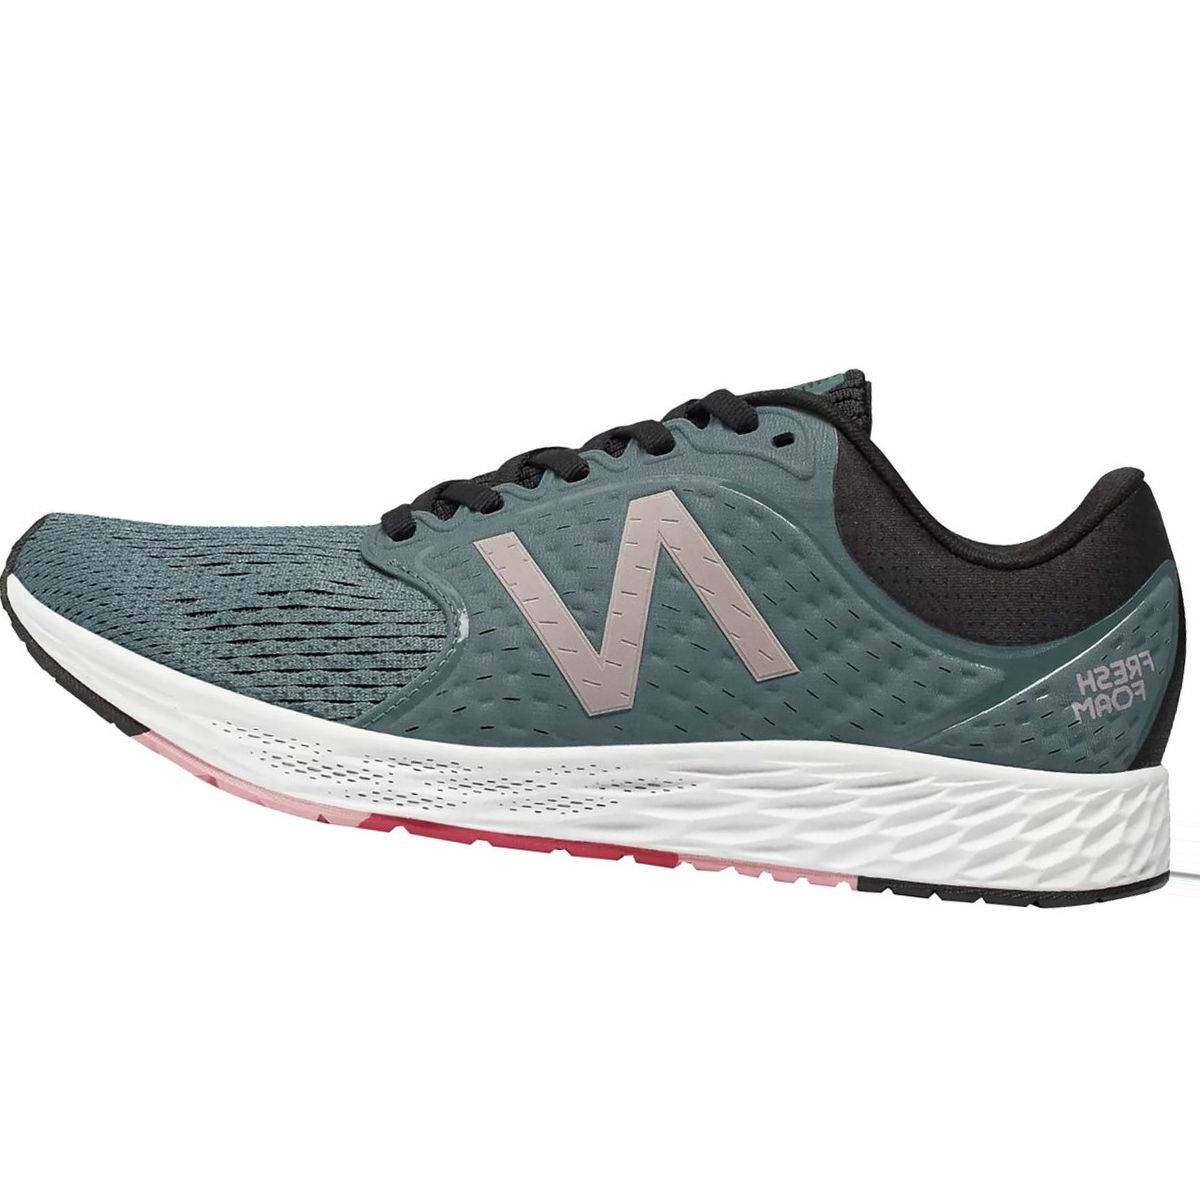 New Balance Fresh Foam Zante v4 Running Shoe - Women's